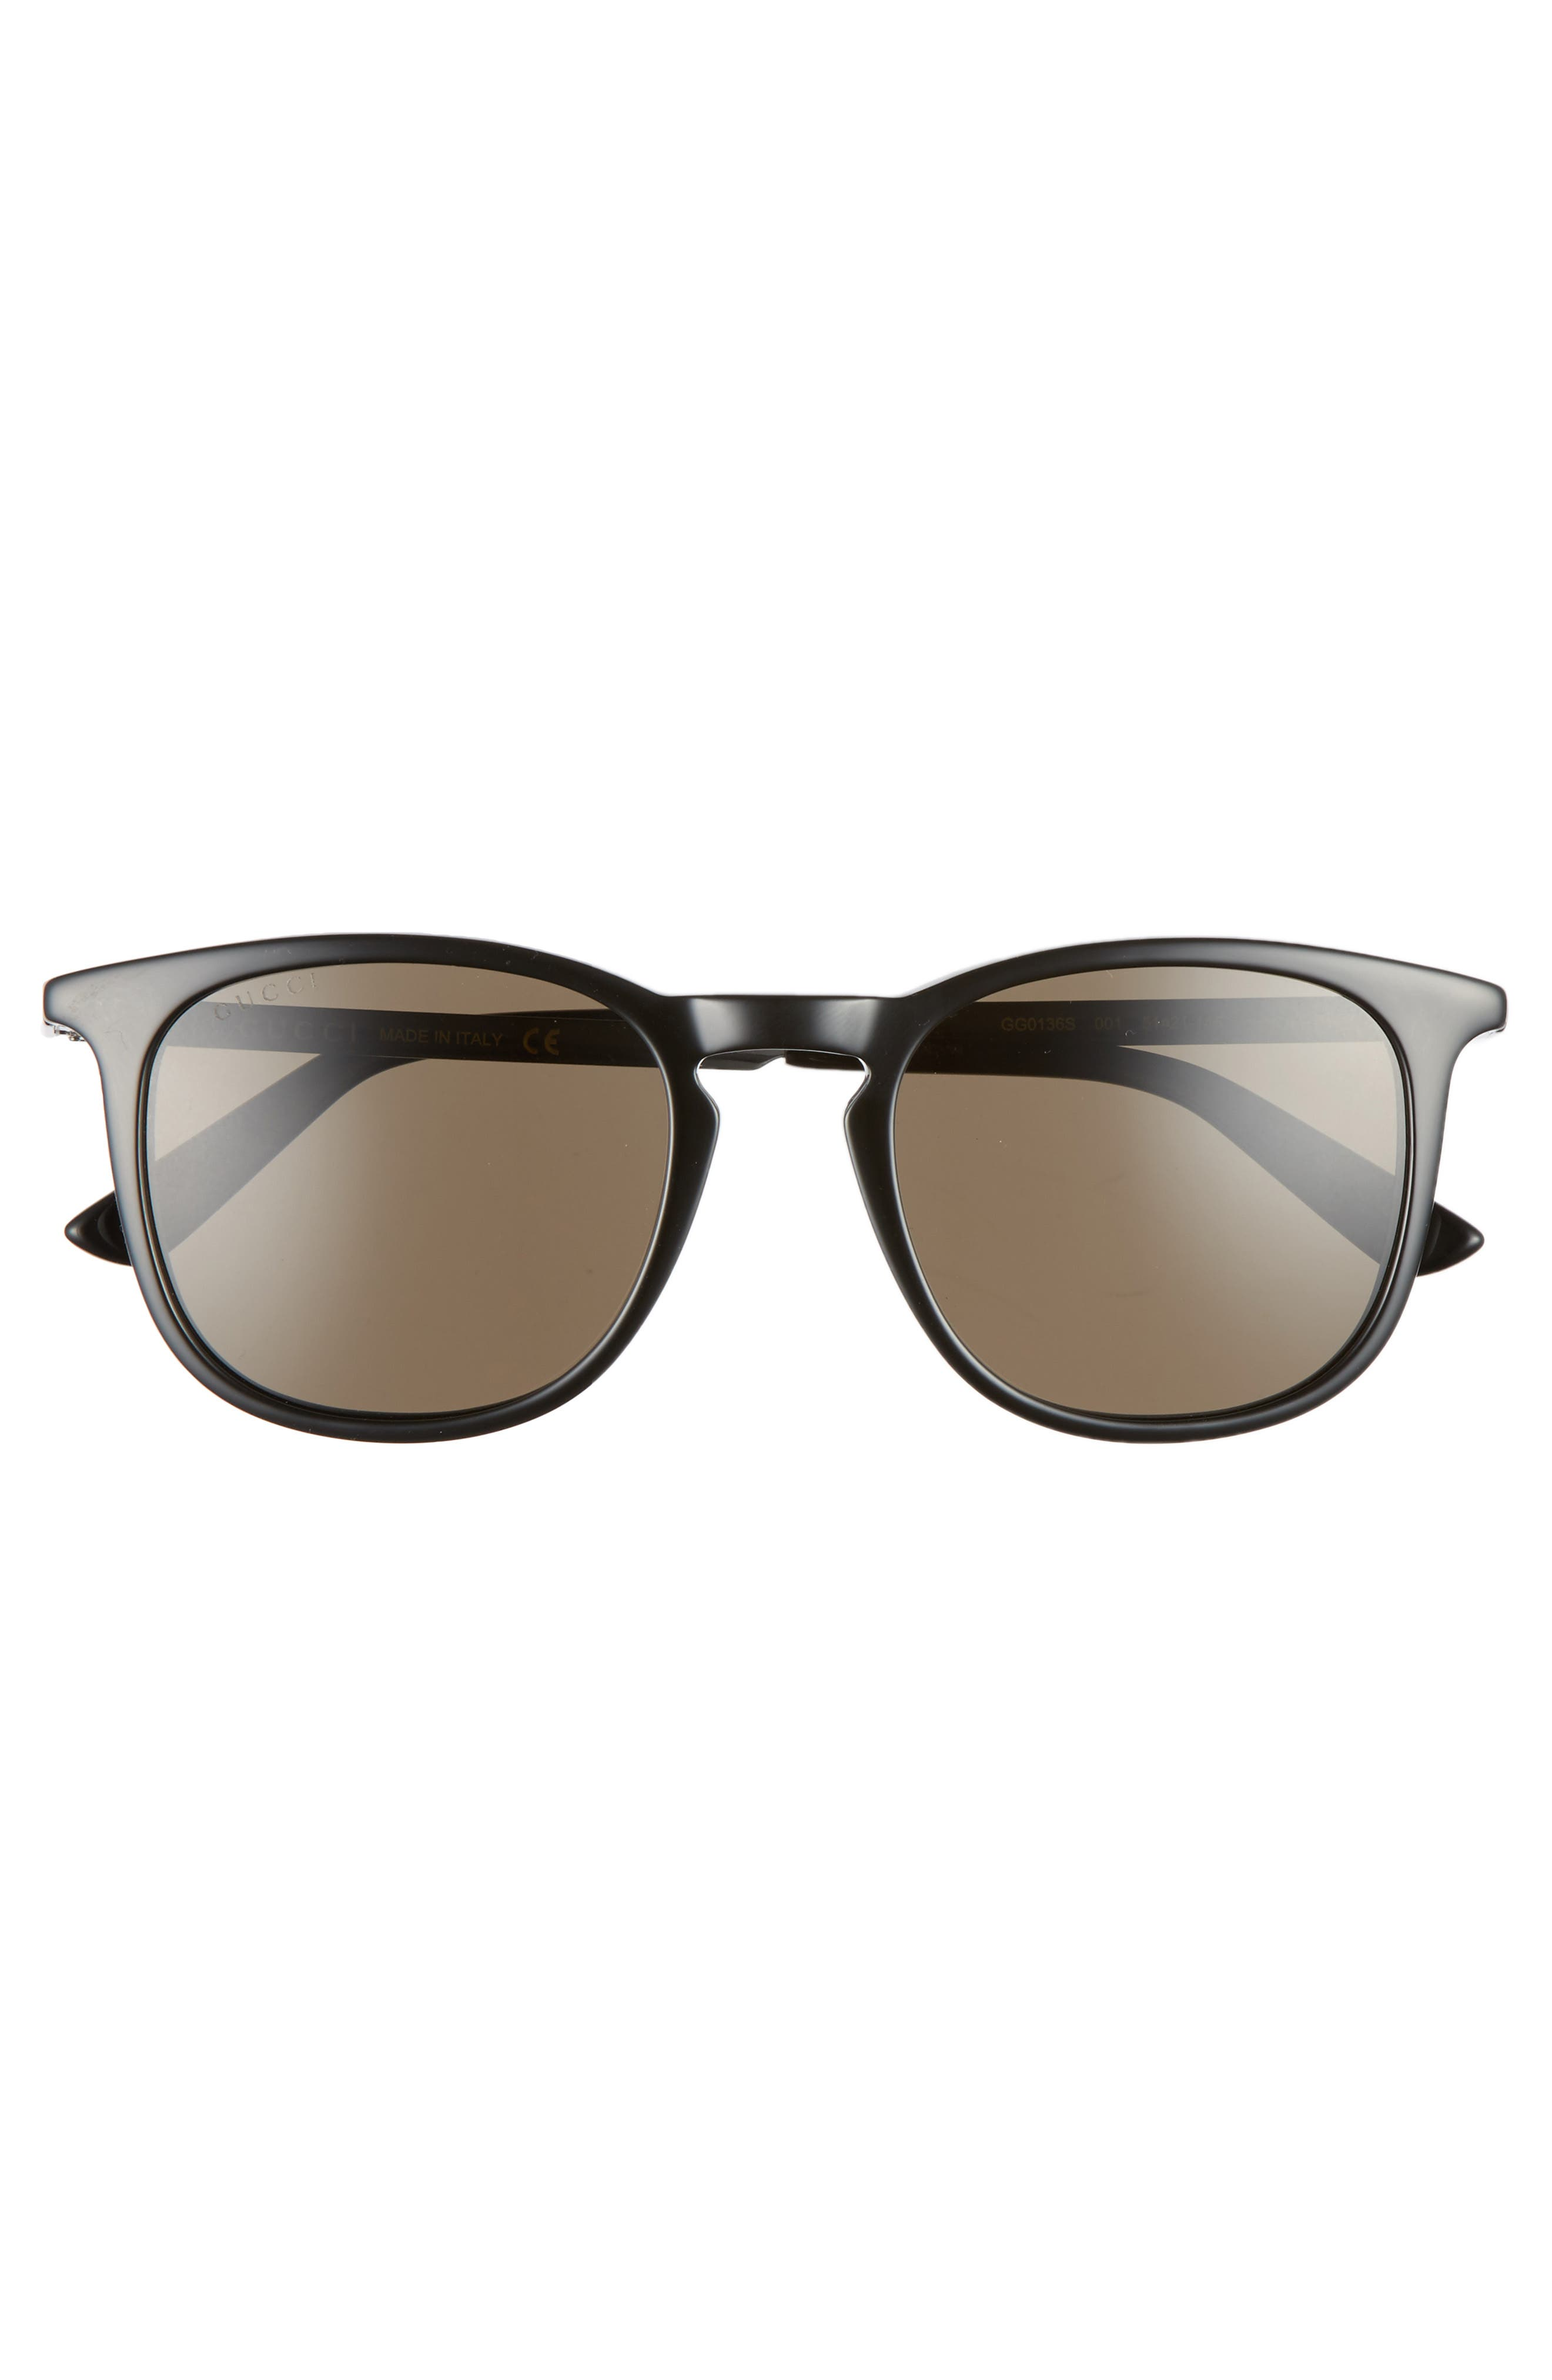 Optyl 51mm Sunglasses,                             Alternate thumbnail 2, color,                             001